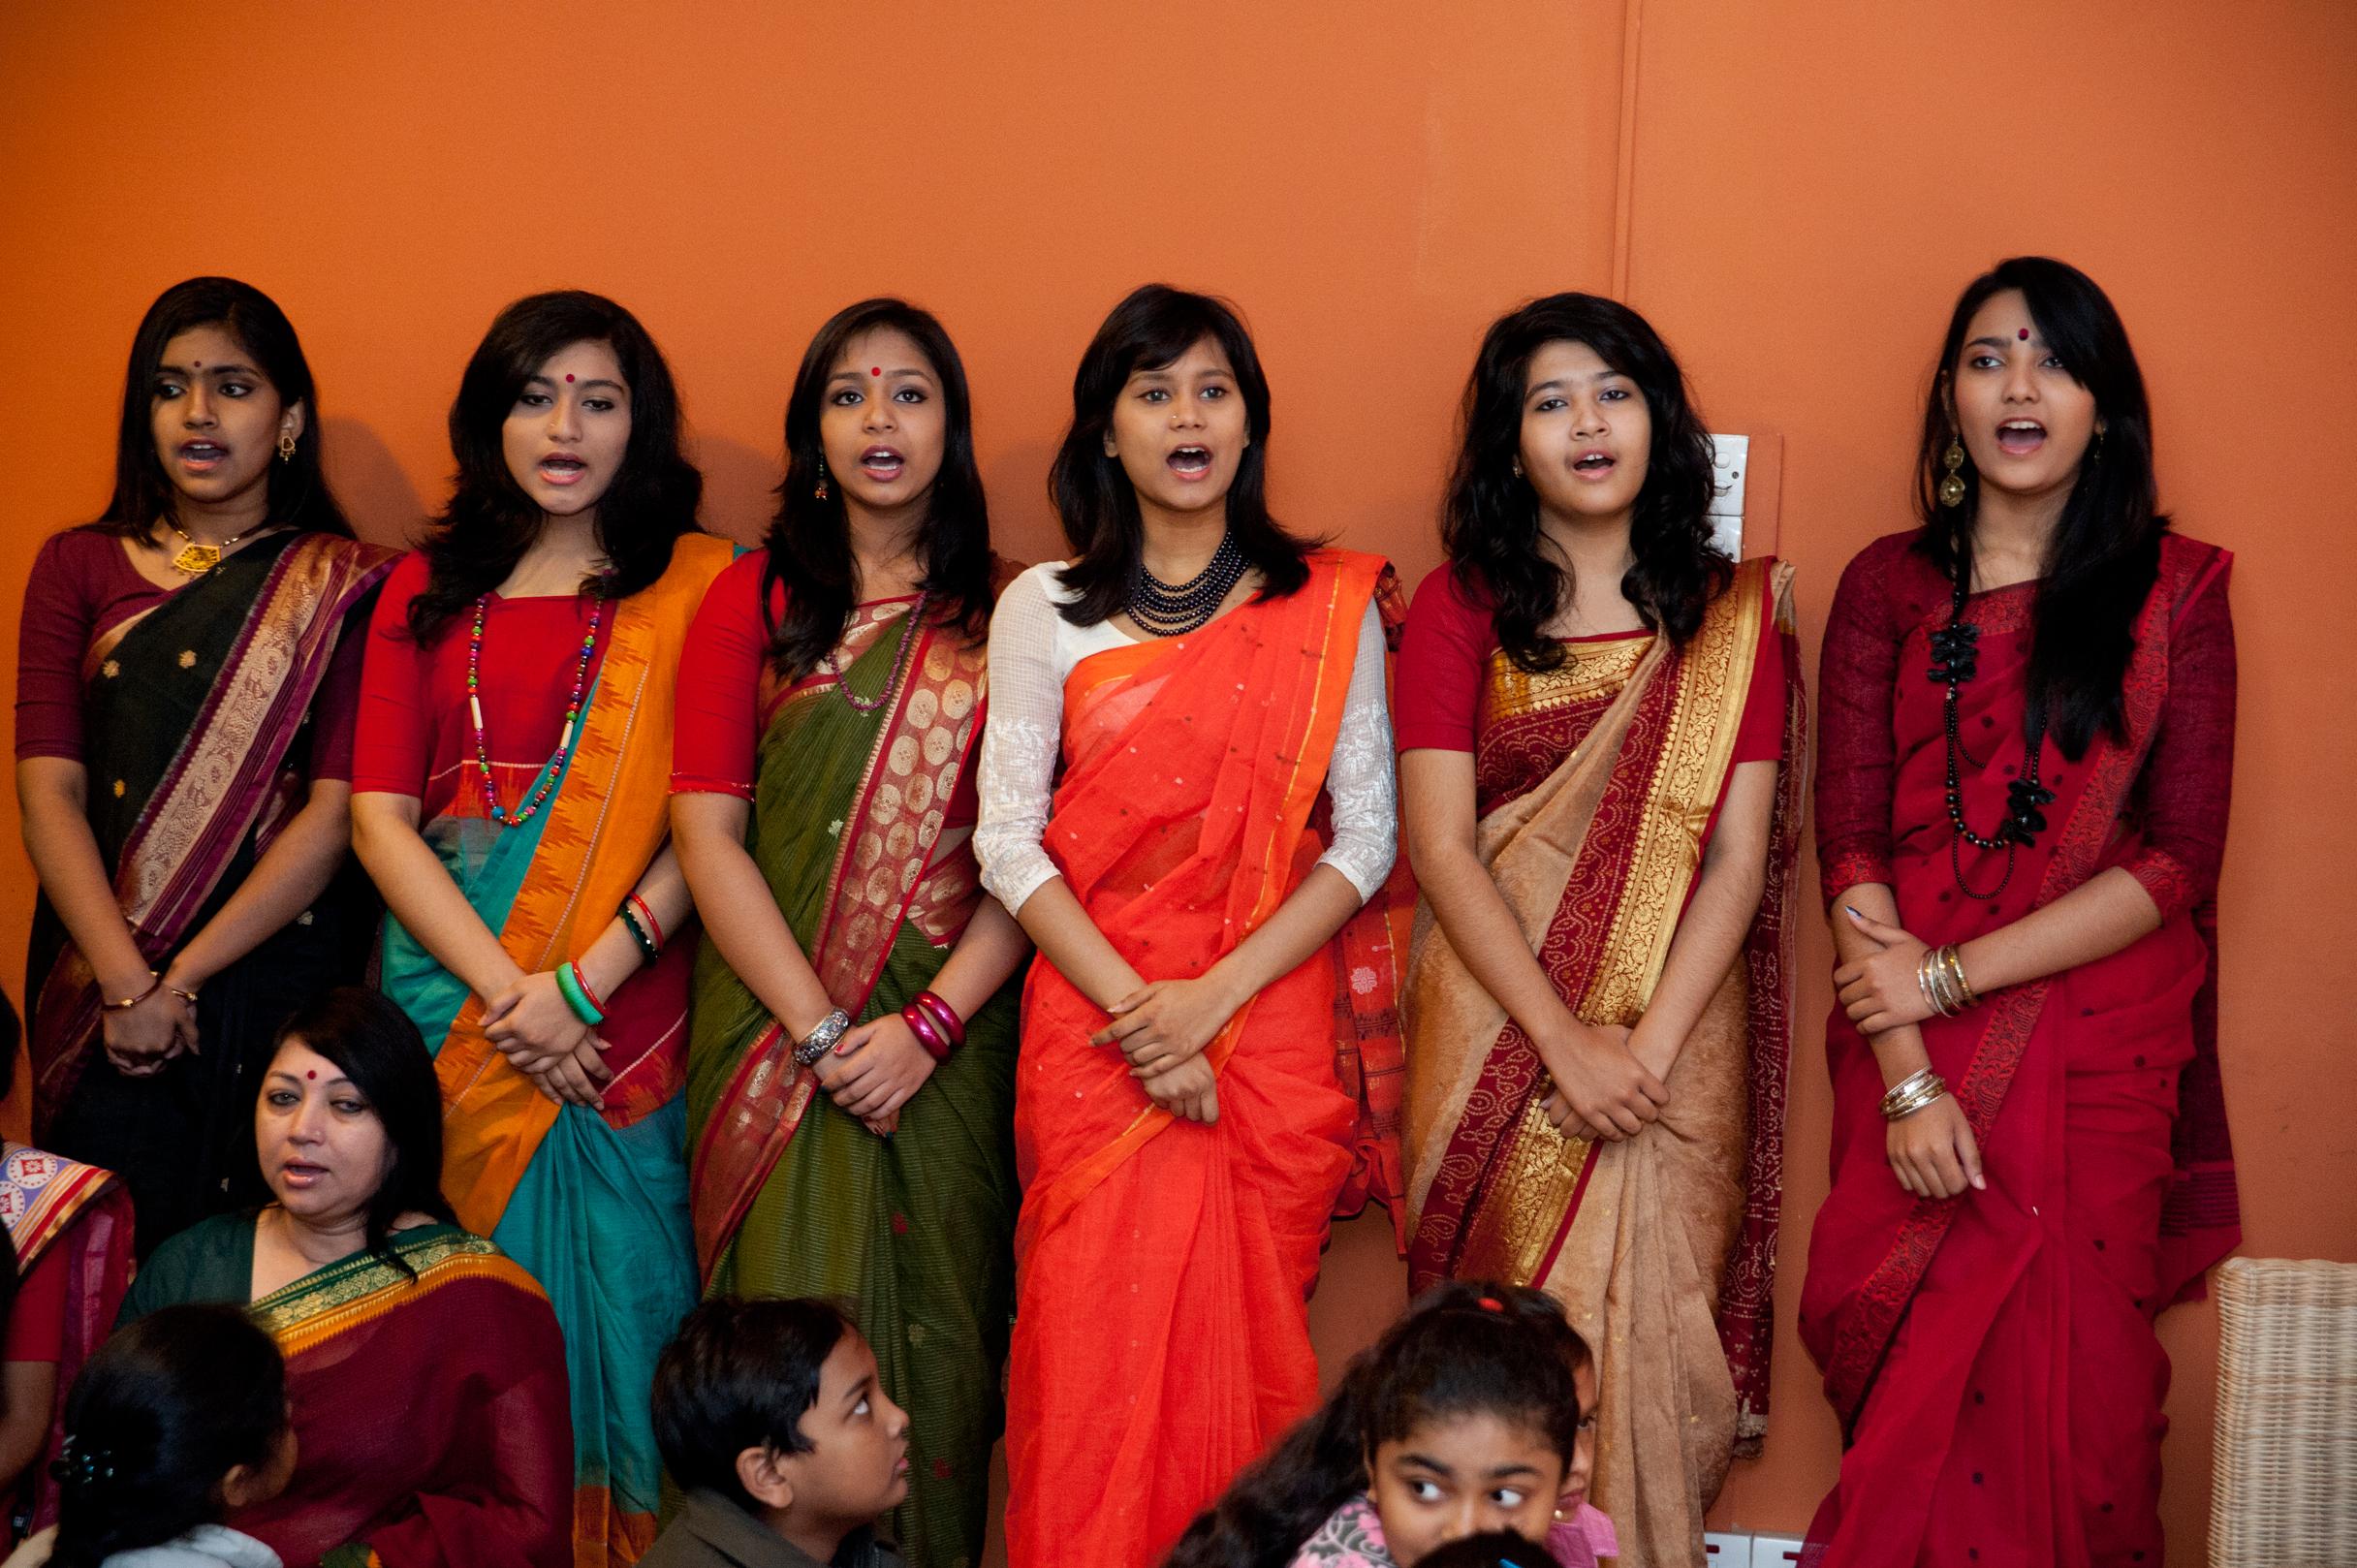 Students of Shurer Dhara performed for us. Photo by Shinobu Suzuki.